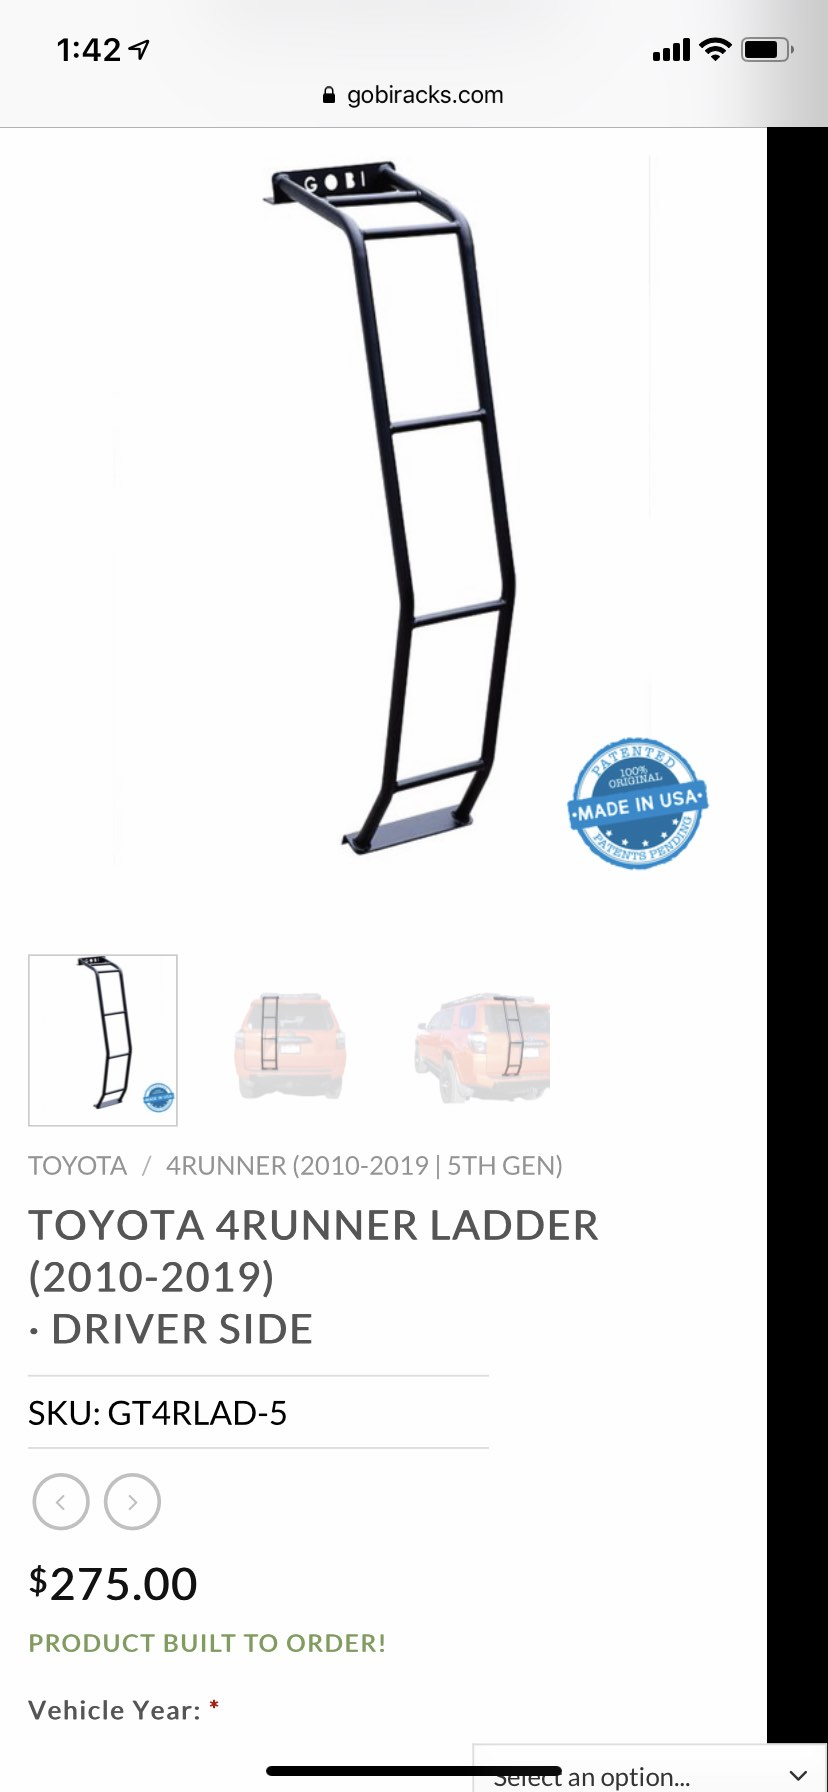 FS Gobi 4Runner (2010-2019) Ladder with Gobi RearGas Springs New 5 Los Angeles, CA-gobi-5th-gen-ladder-1-jpg